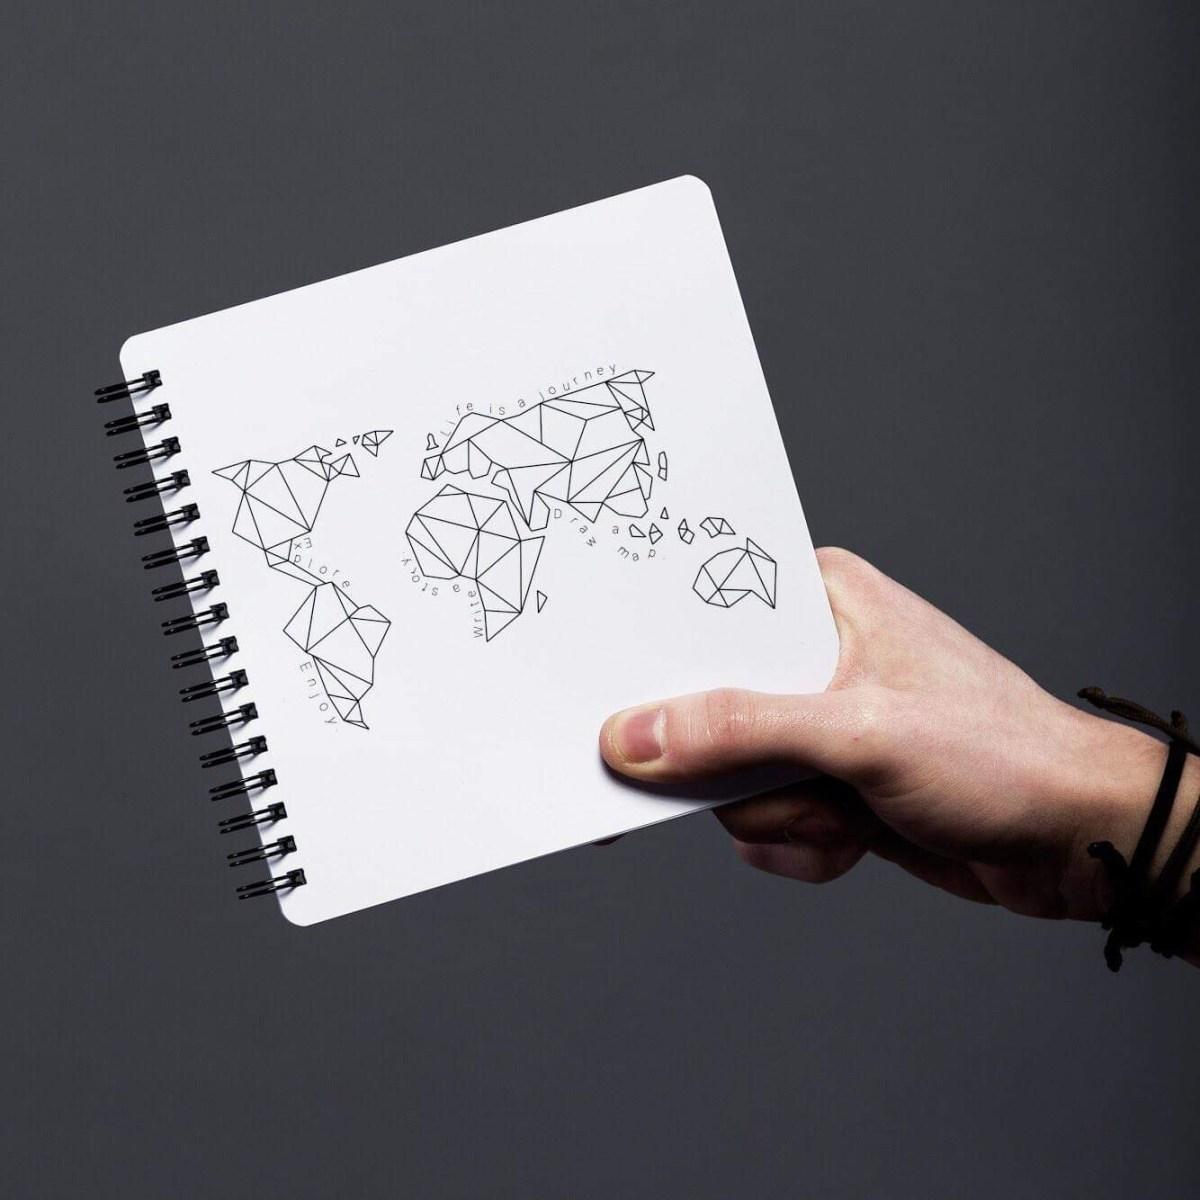 Organized.si notebook.  Photo by Kristin Švab,  @kristijansvab